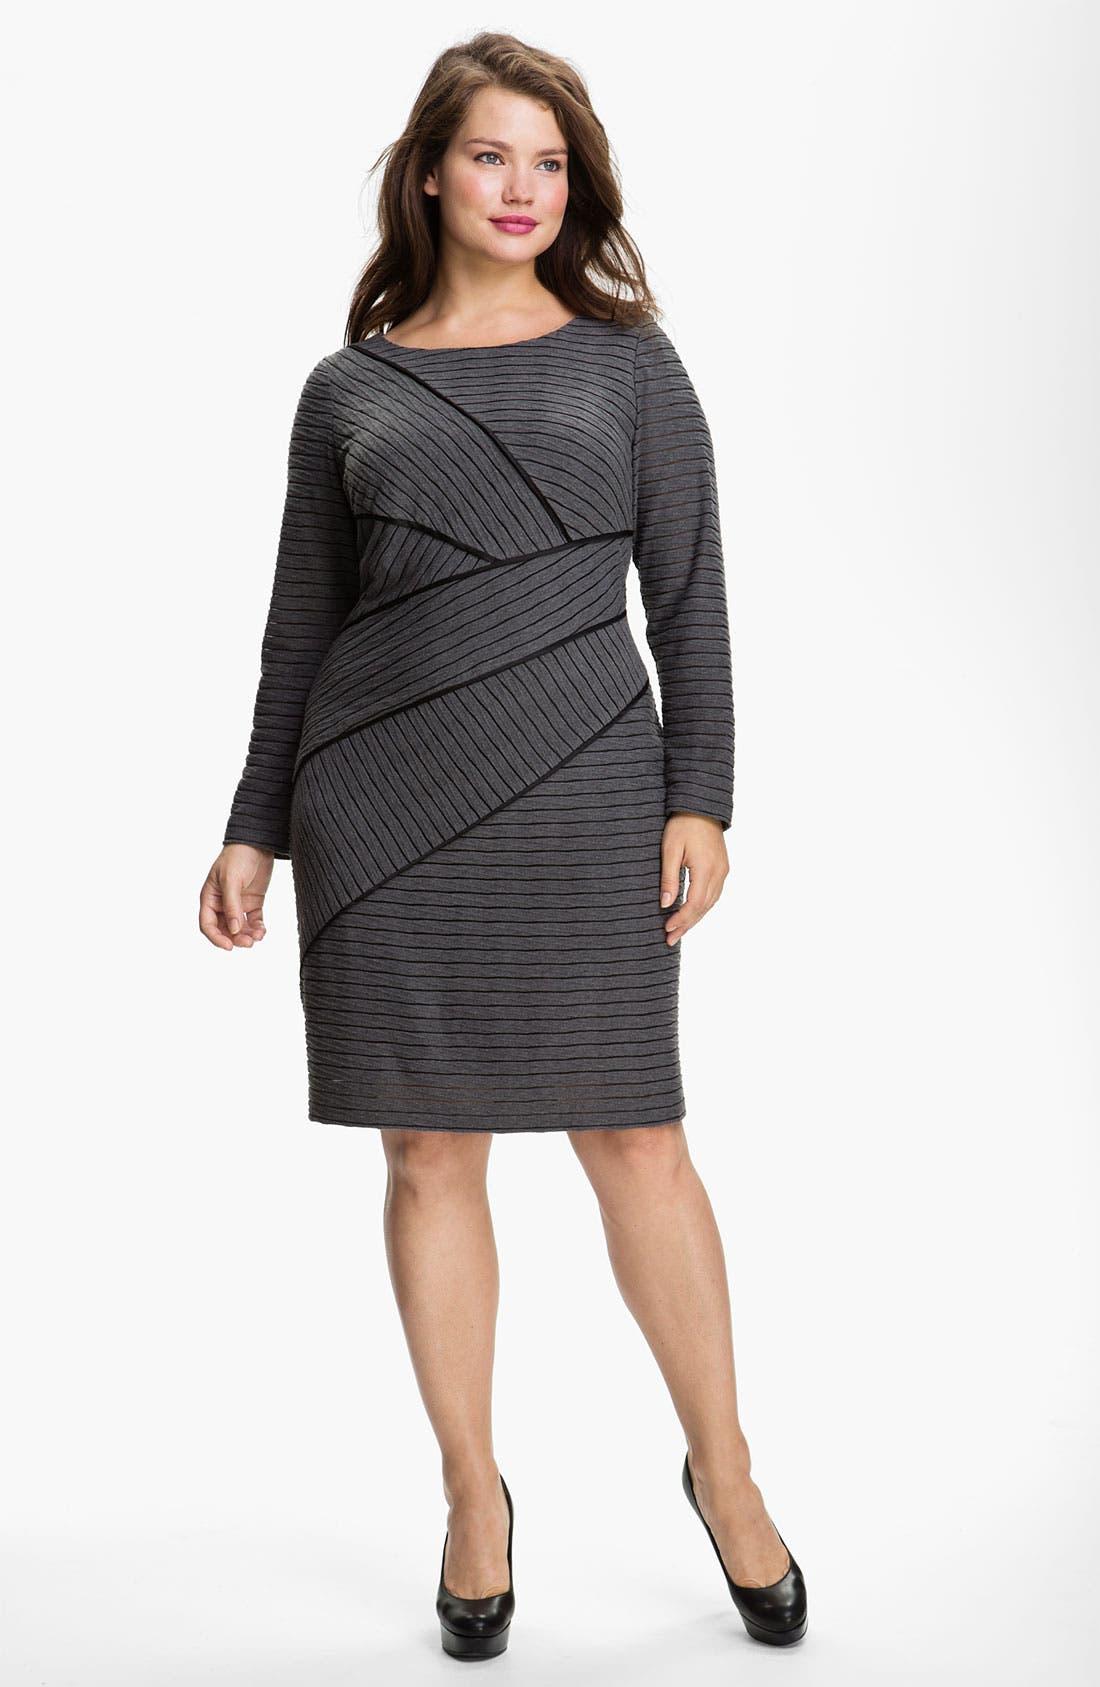 Alternate Image 1 Selected - Adrianna Papell Asymmetric Seamed Sheath Dress (Plus)